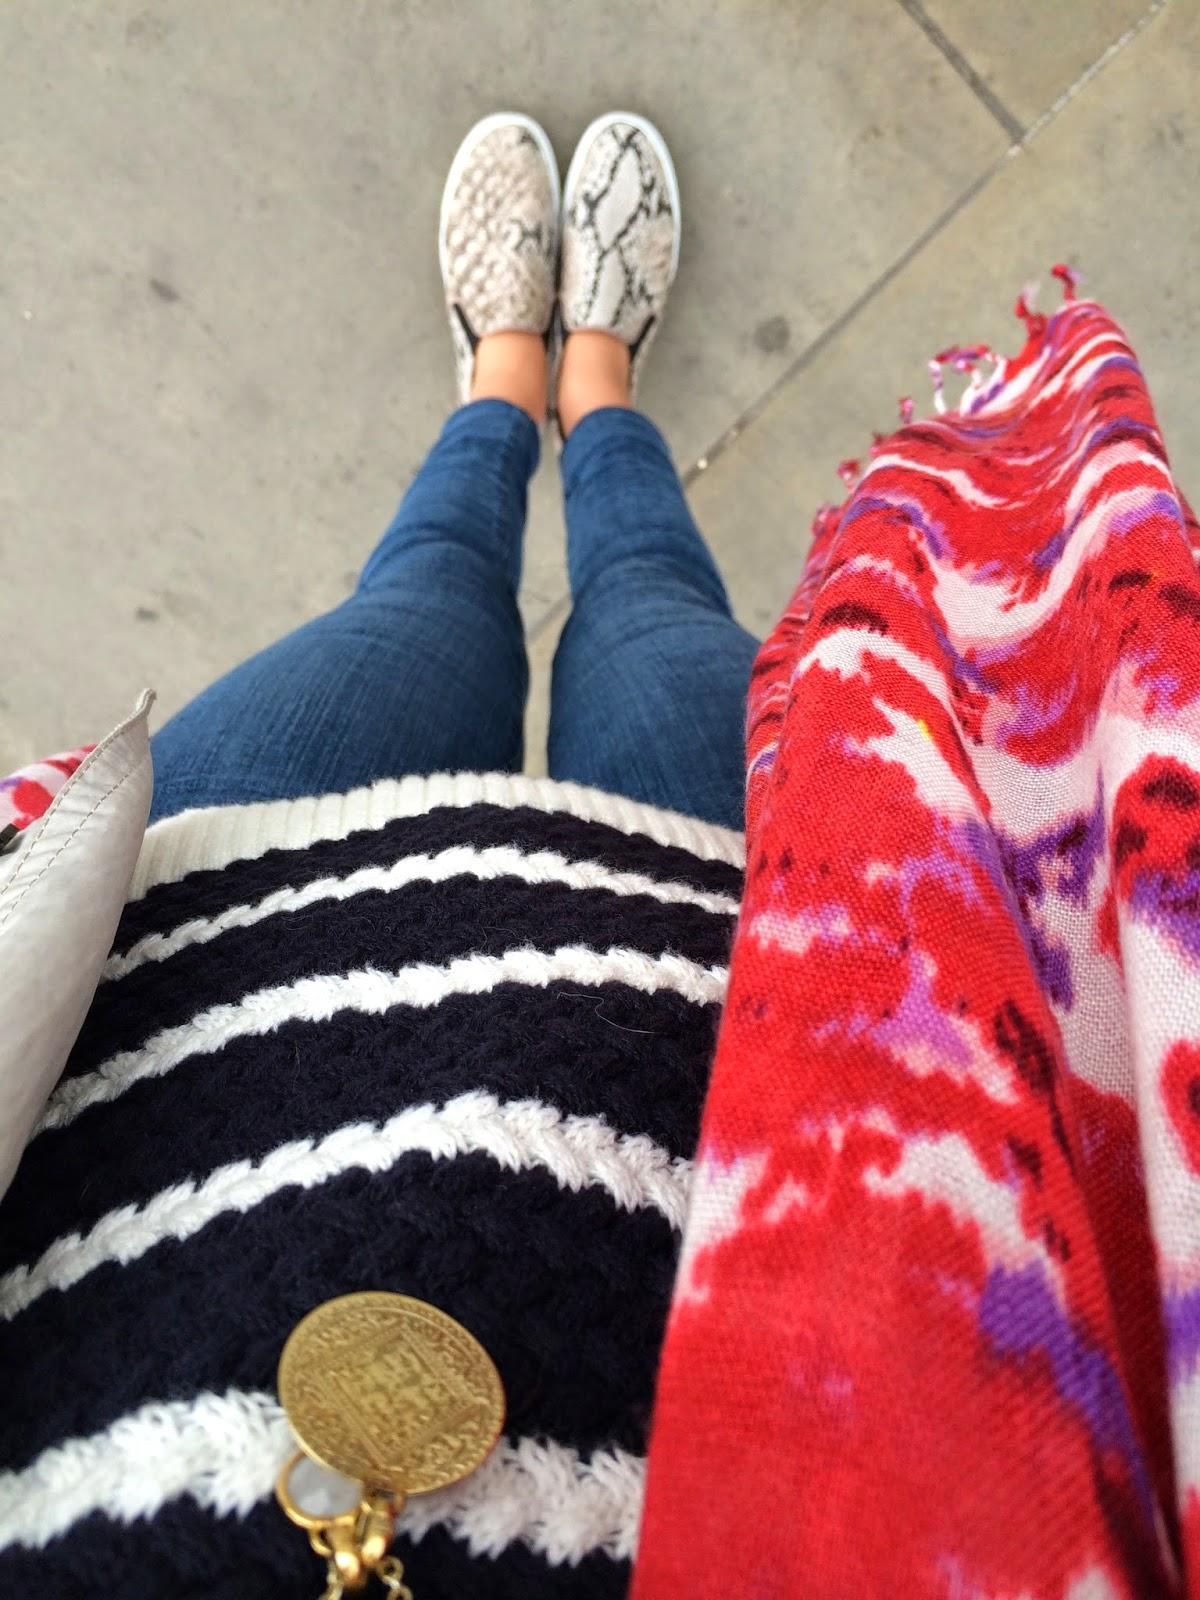 fwist, breton stripes, hobbs breton stripes, j brand jeans, hm slipsons, slip ons, monica vinader, red scarf, red printed scarf